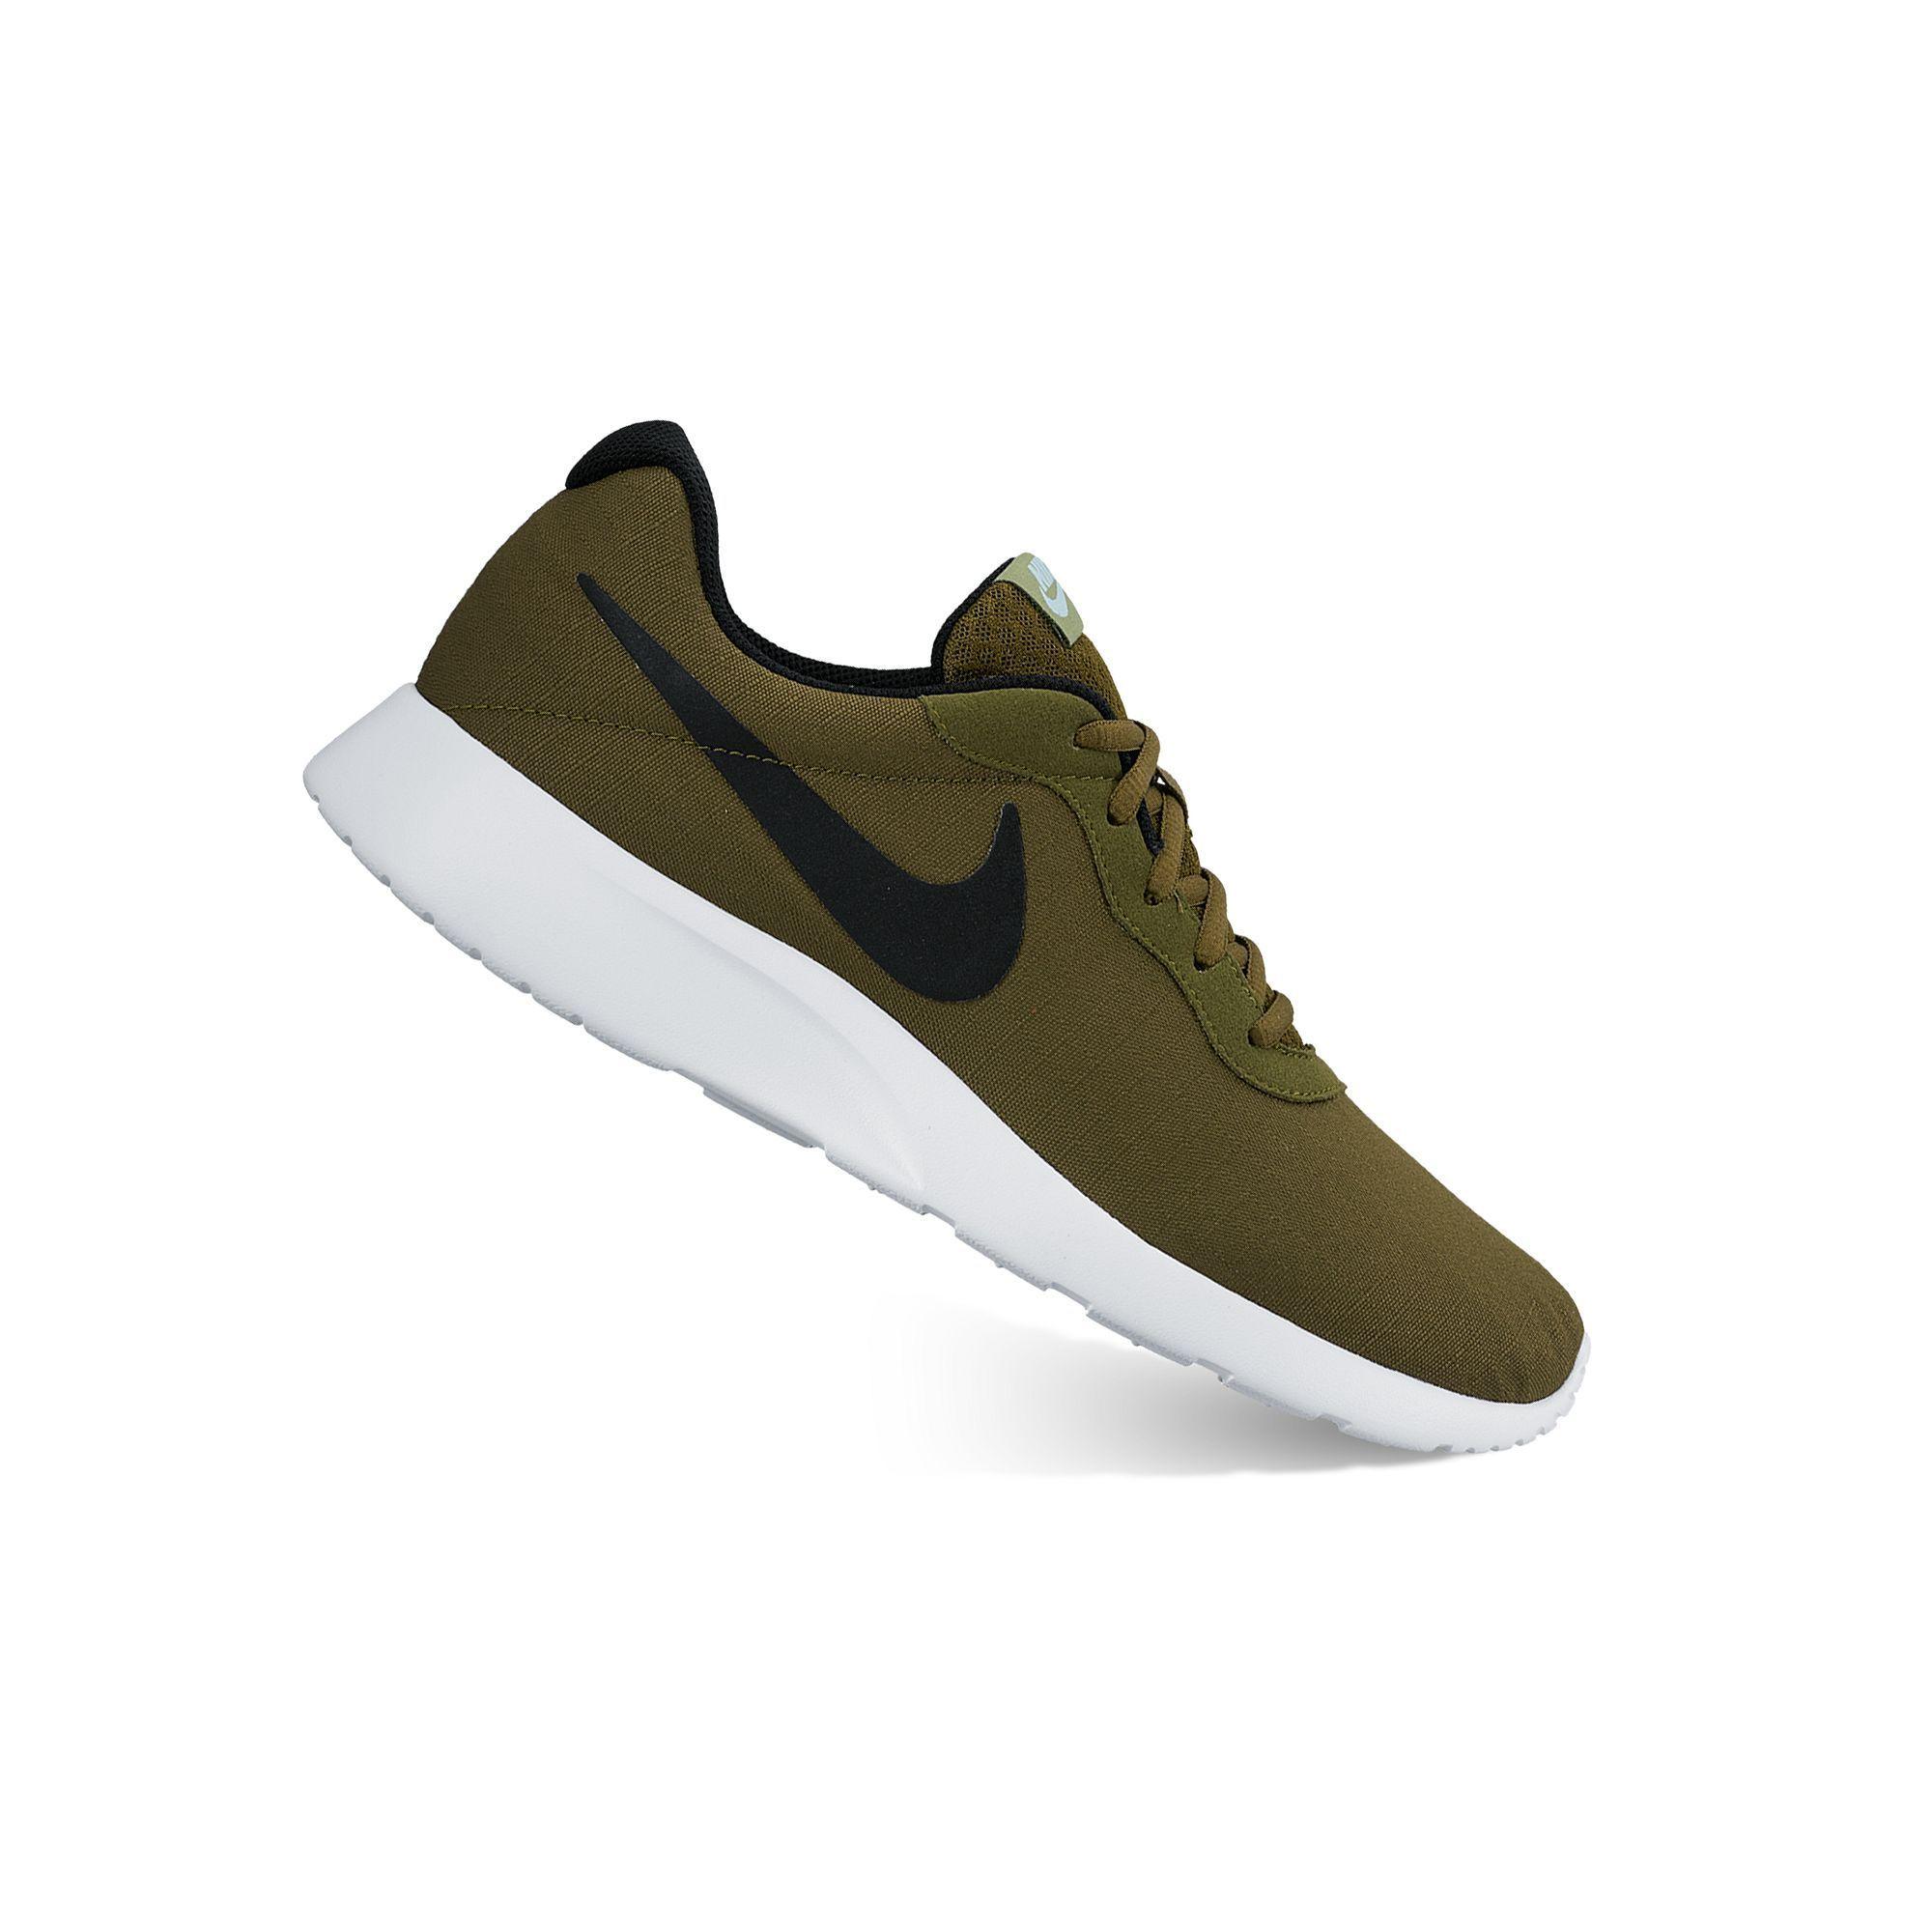 Nike Tanjun Premium Men's Shoes, Size: 10.5, Green